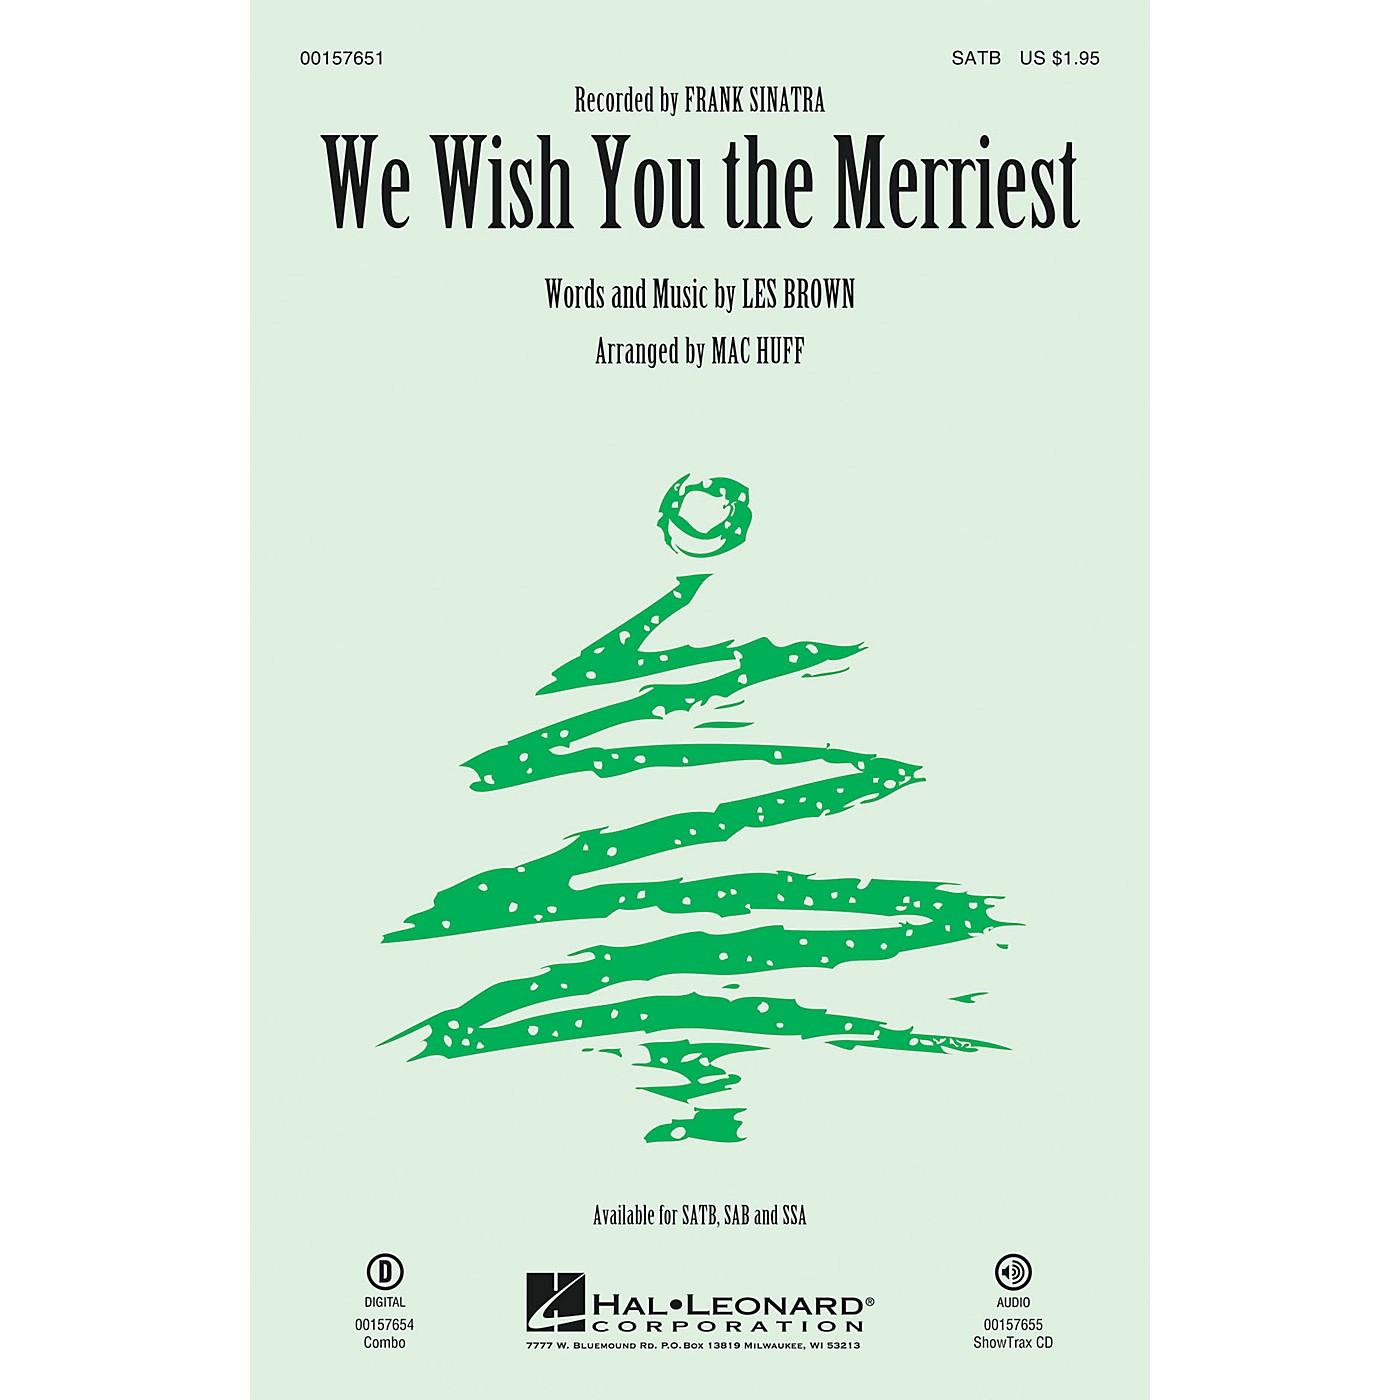 Hal Leonard We Wish You the Merriest SAB by Frank Sinatra Arranged by Mac Huff thumbnail